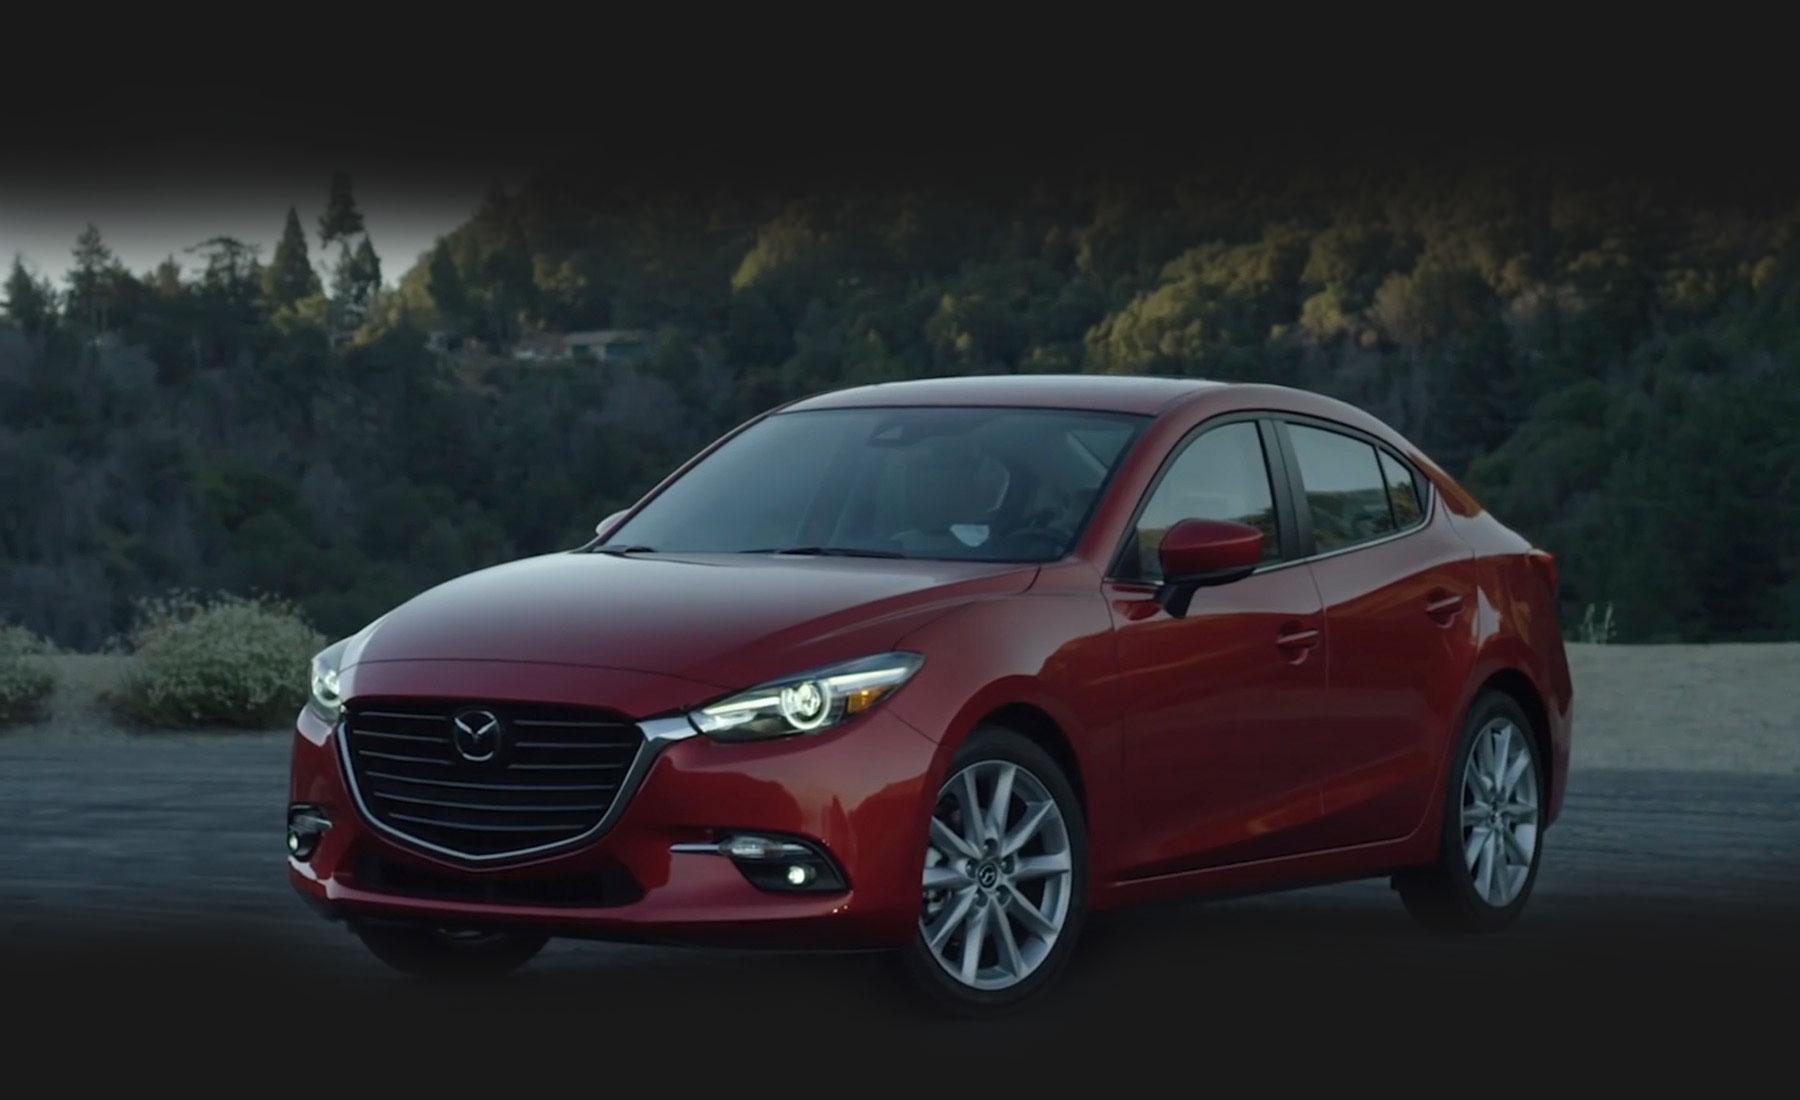 Nuevo Mazda 6 2018 >> Mazda 3 Sedán 2018 | Drive Together